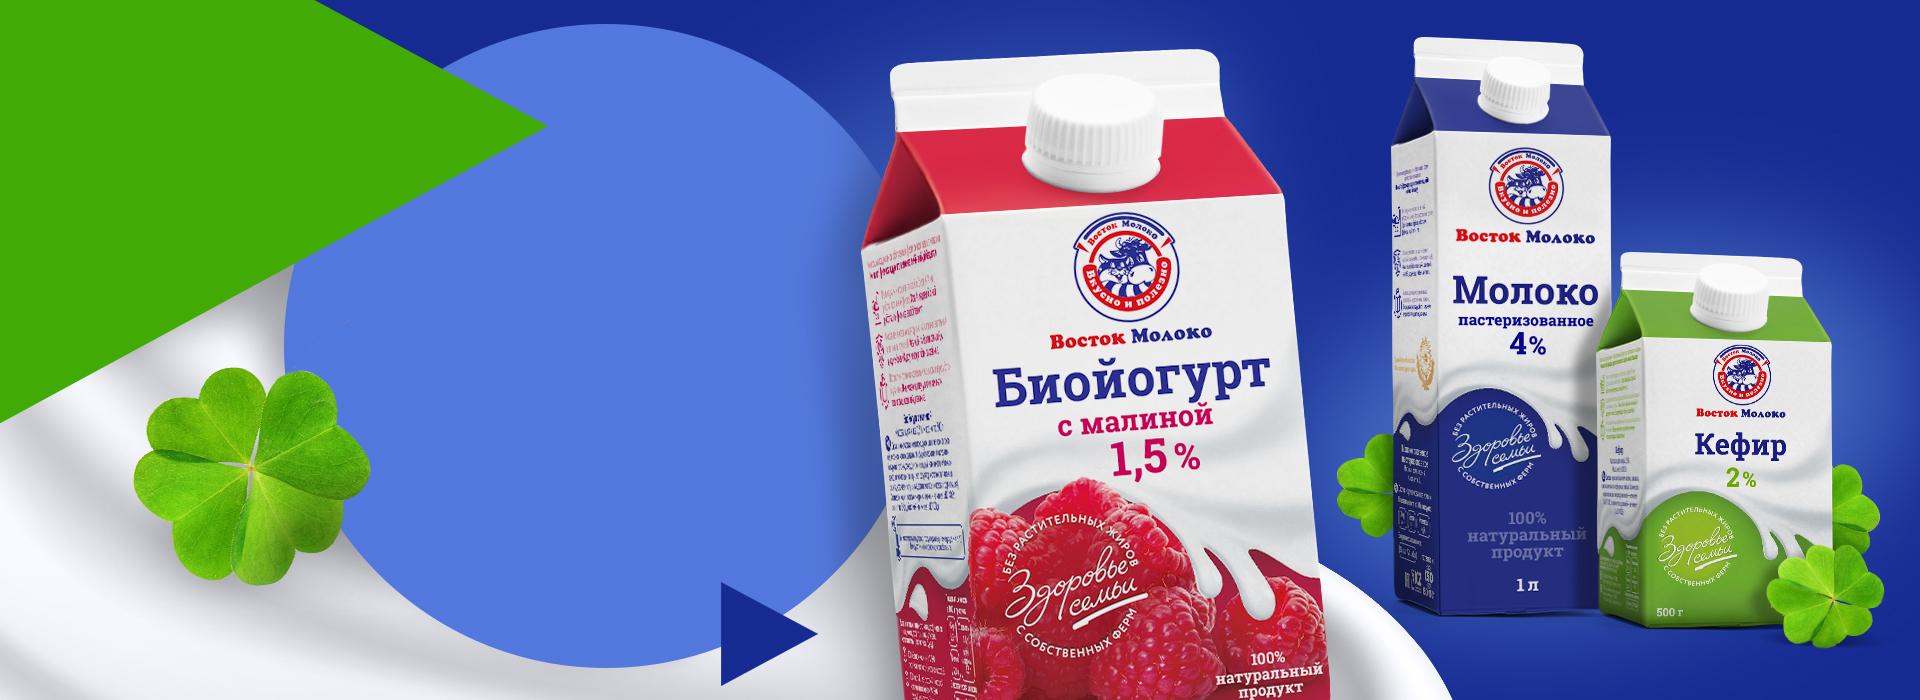 Восток молоко жуковский фото